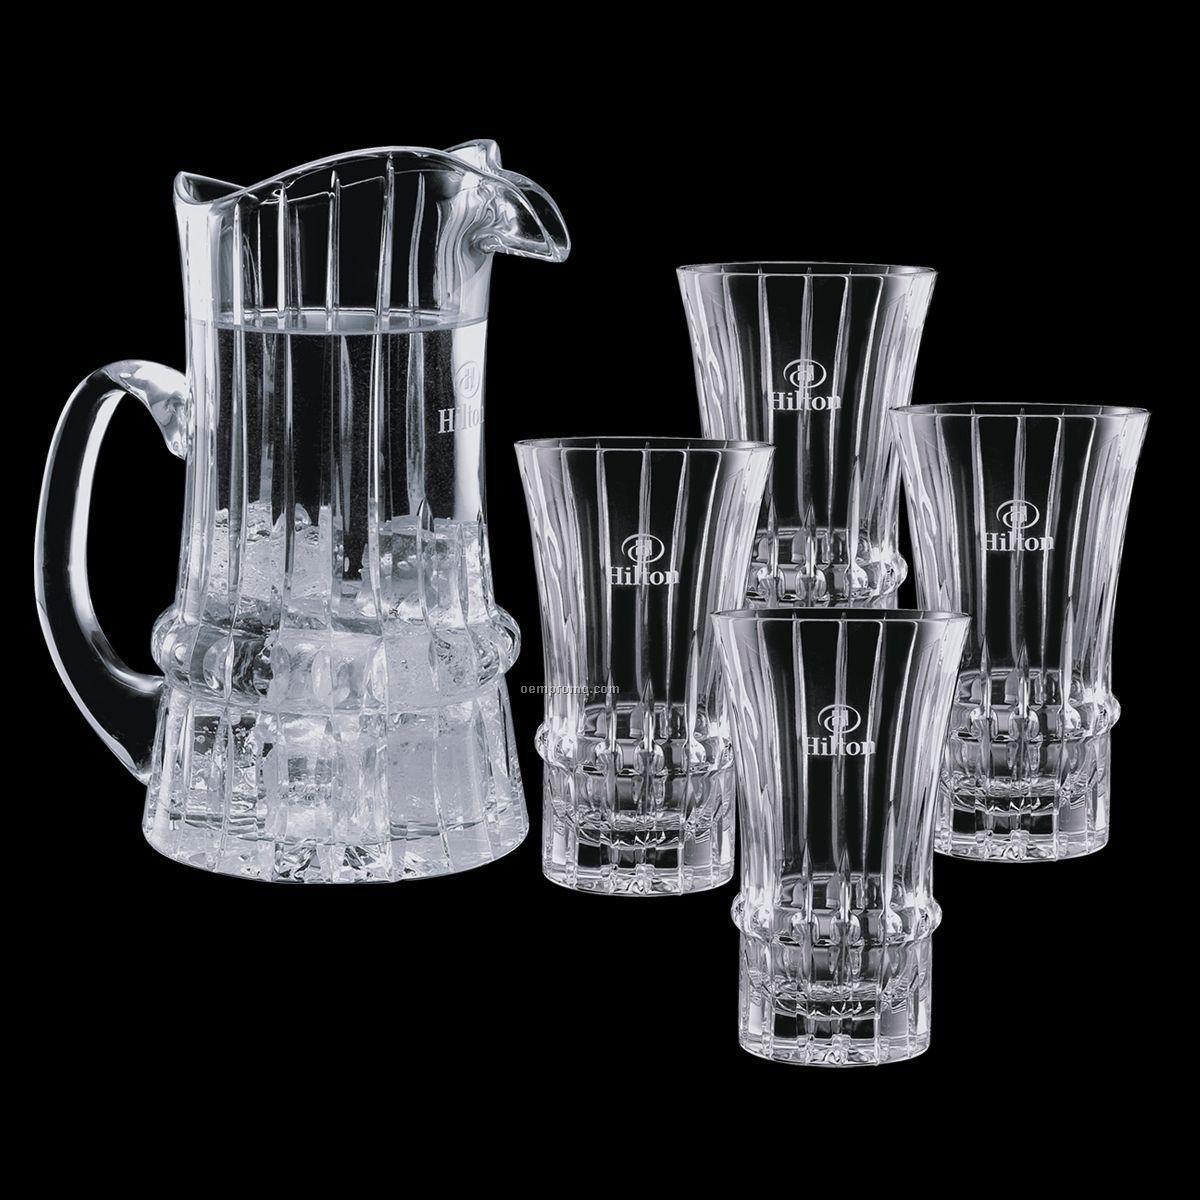 30 Oz. Steinbach Pitcher & 4 Cooler Glasses